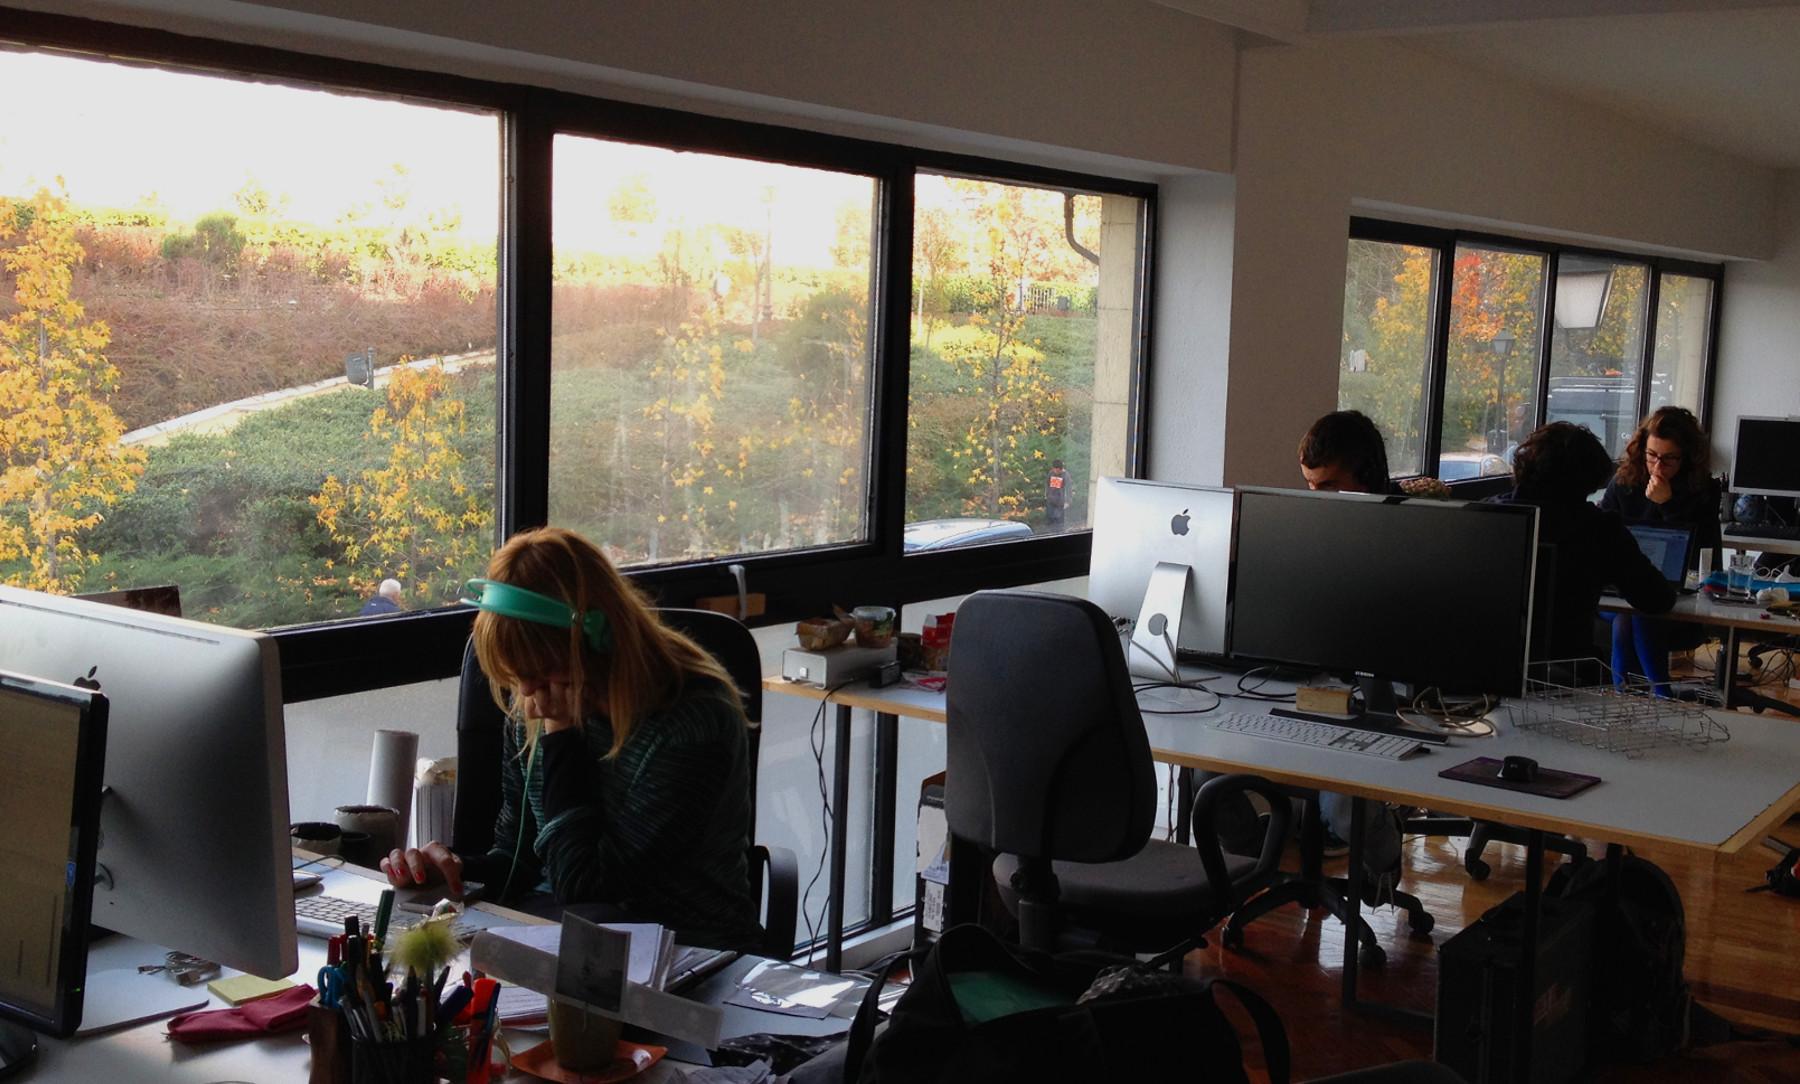 Coworking_Madrid_Quinta_del_sordo_14